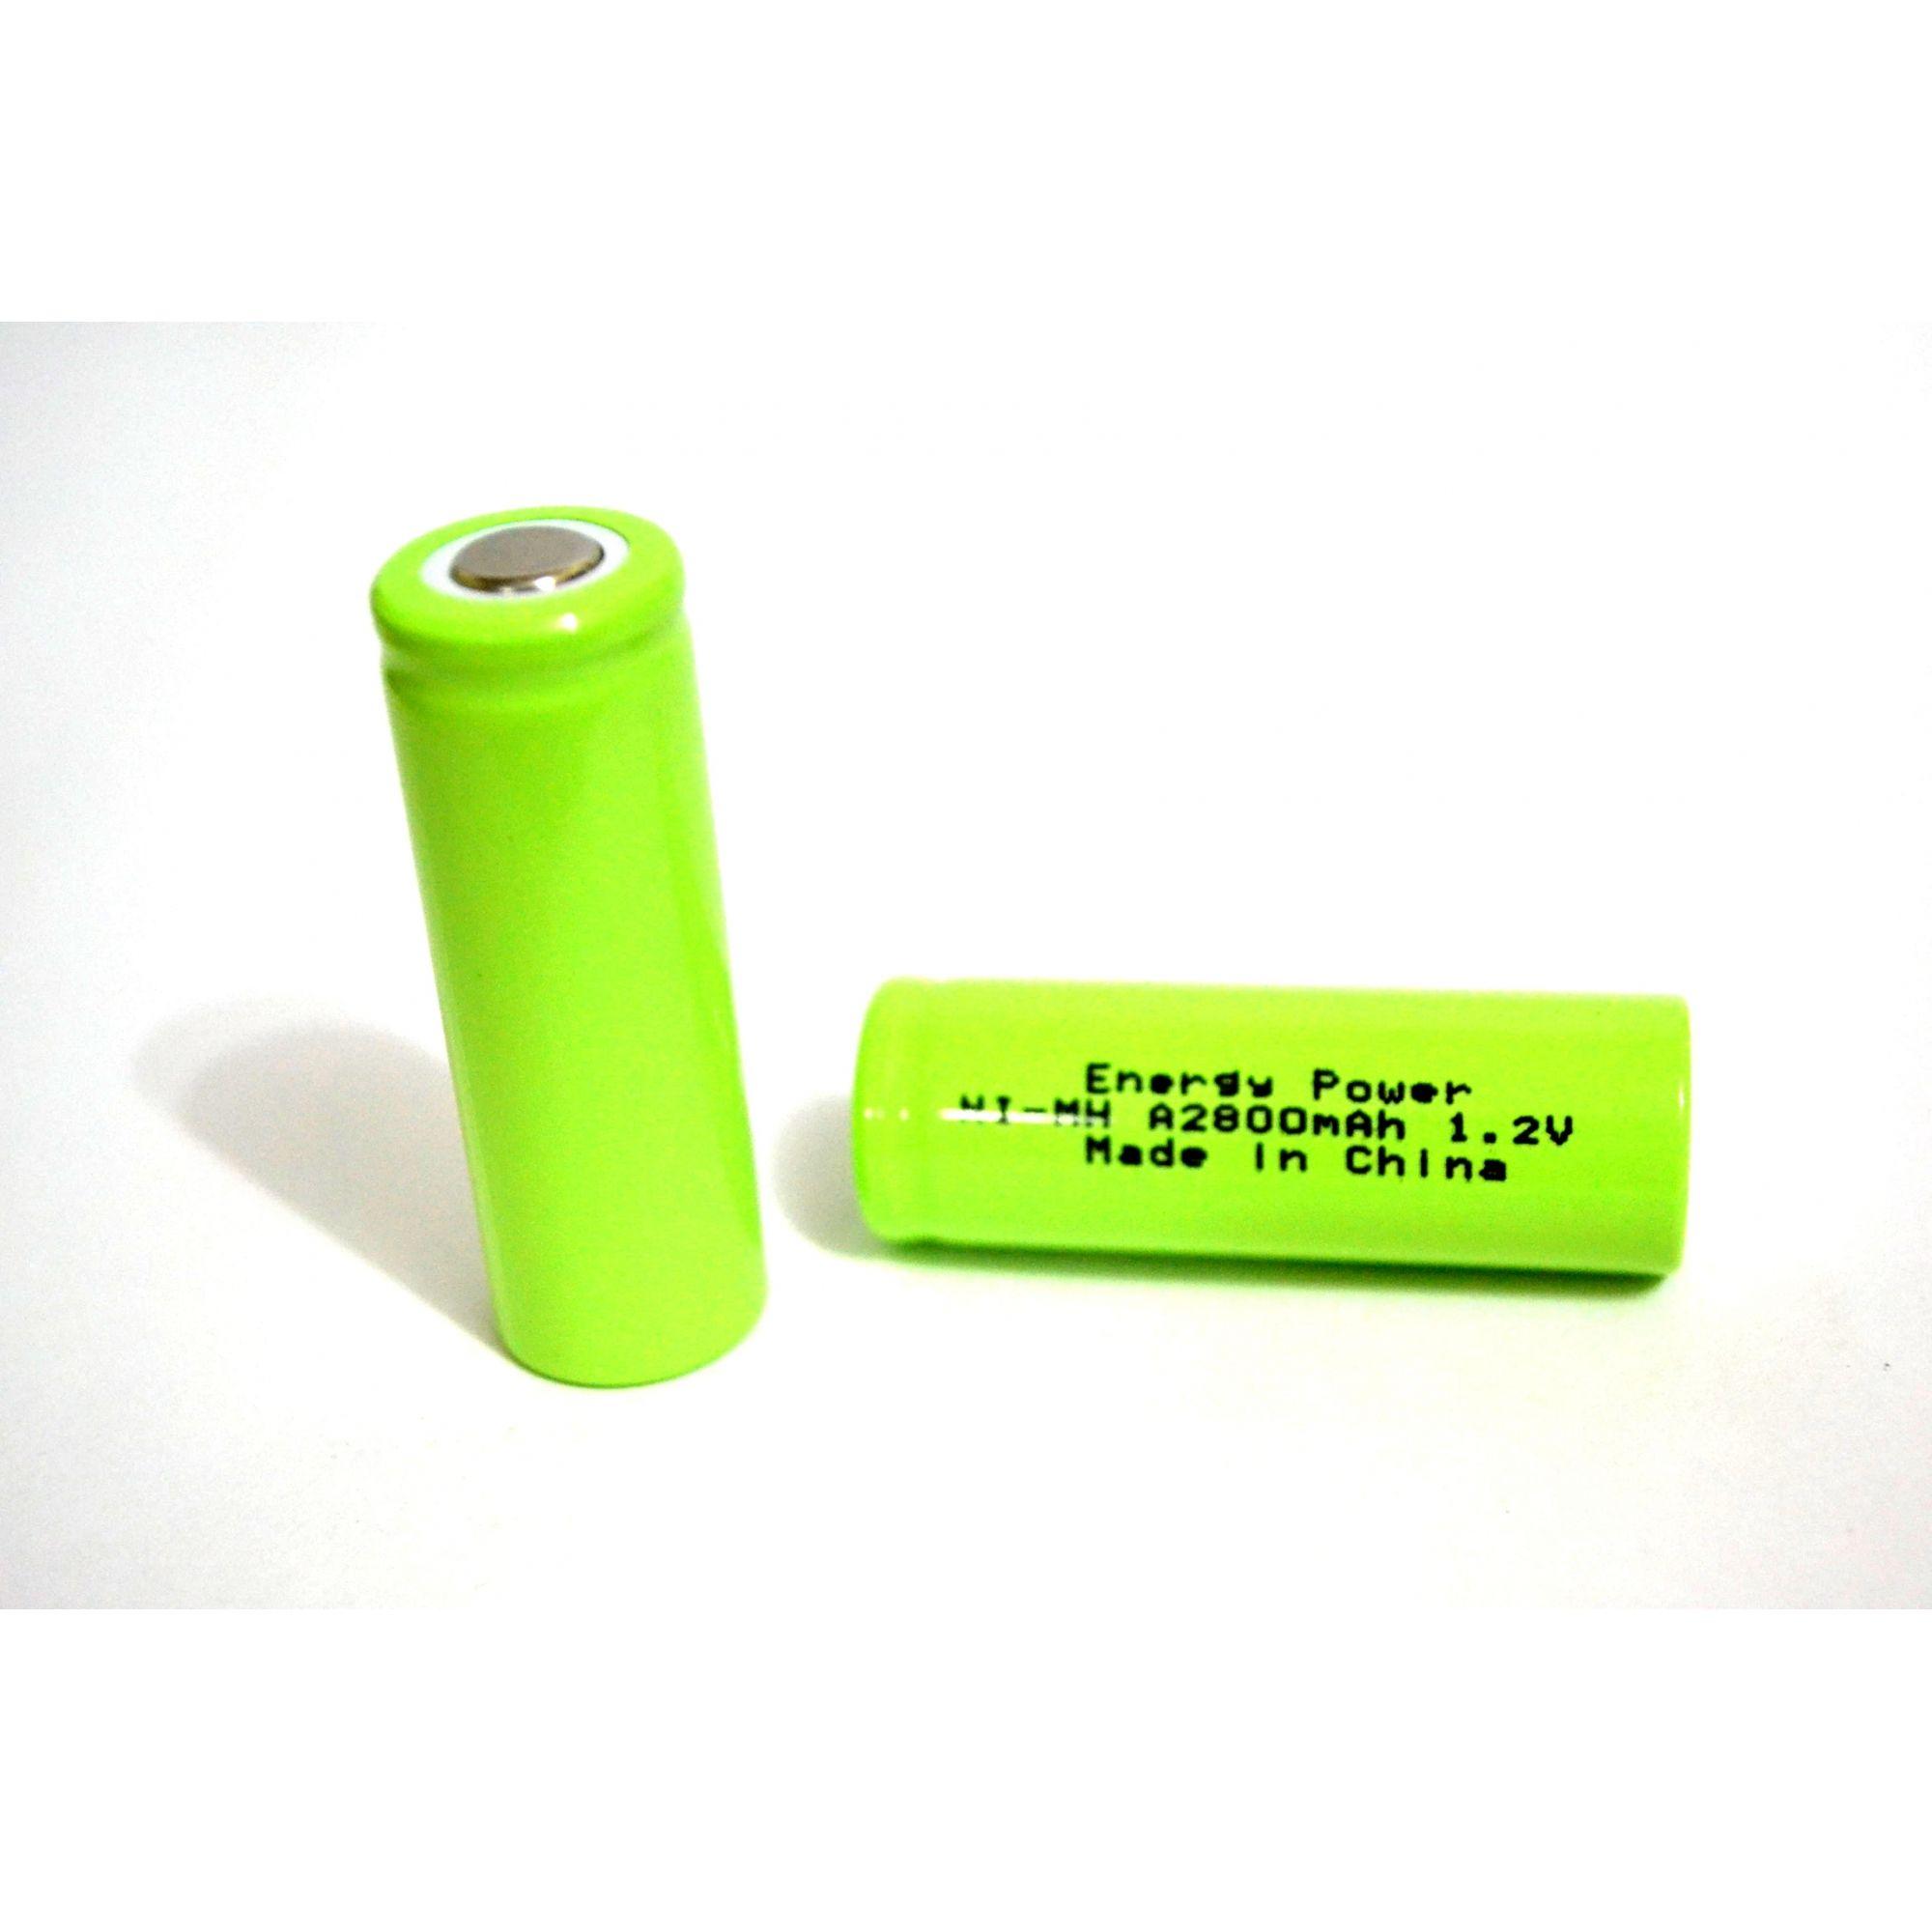 BATERIA ENERGY POWER A 2800MAH 1,2V NI-MH